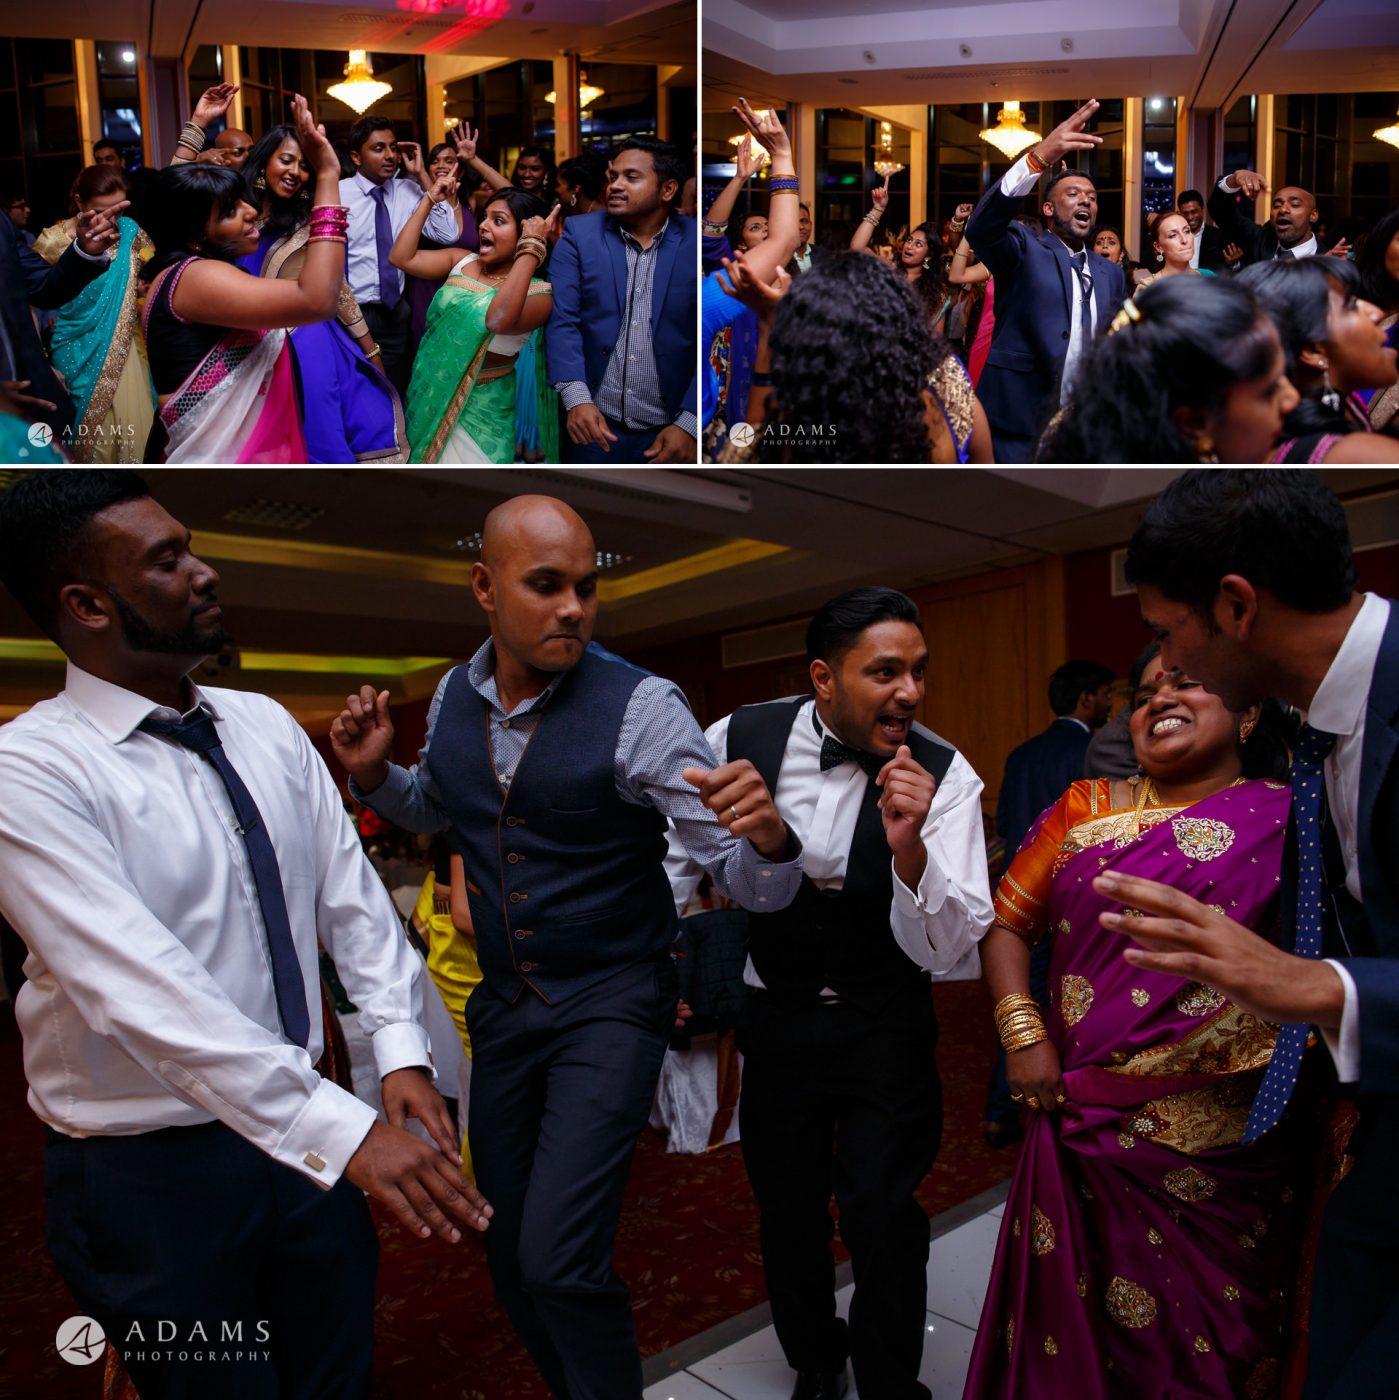 Baylis House Wedding Photographer | Sara + Anojan 32